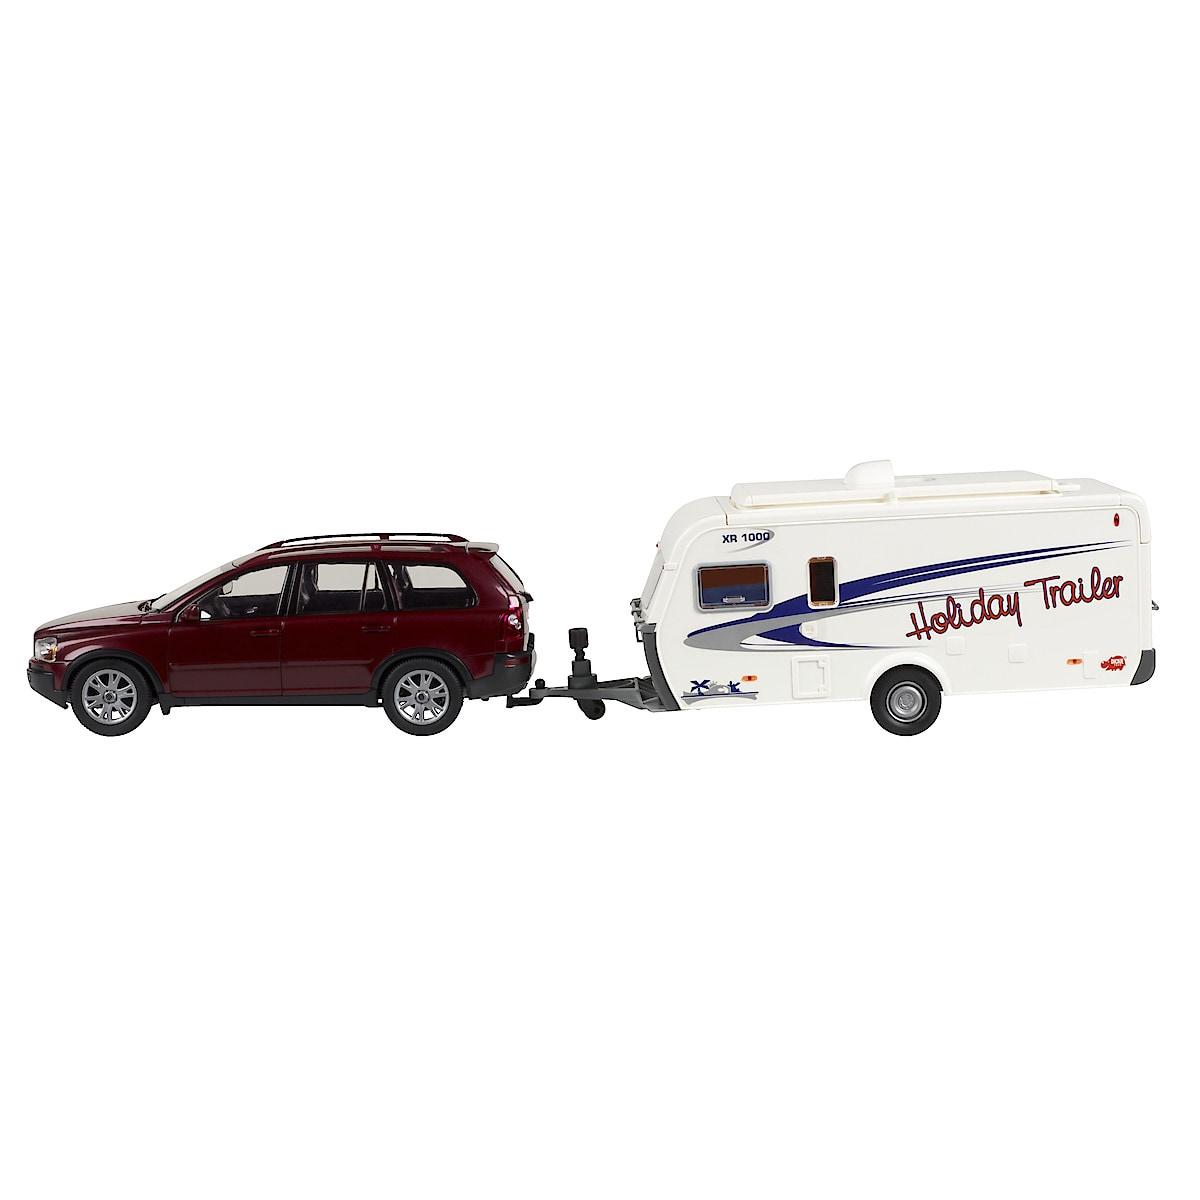 Holiday Trailer, bil med campingvogn